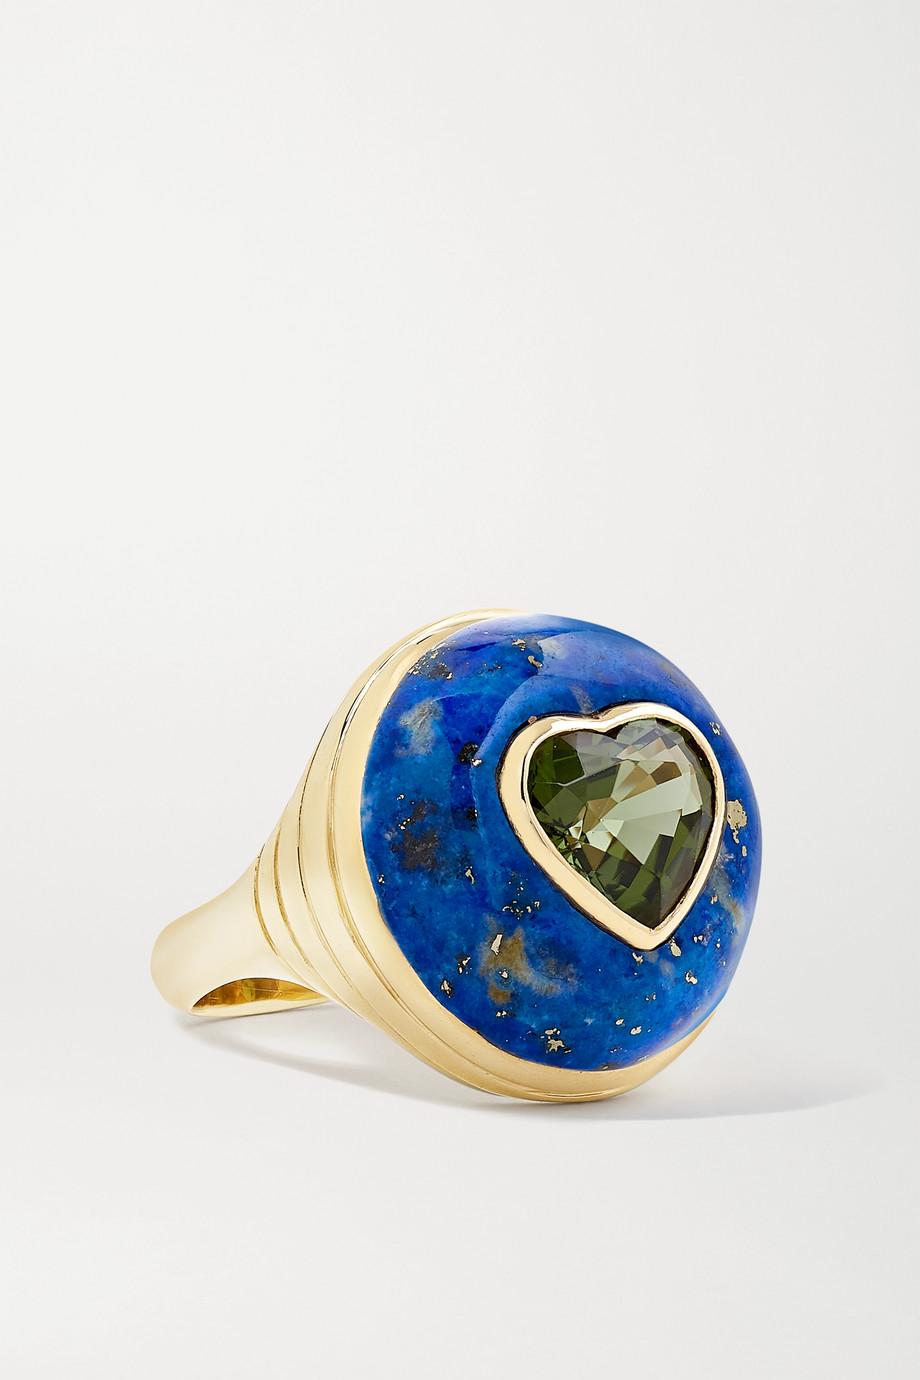 Retrouvaí Lollipop small 14-karat gold, lapis lazuli and tourmaline ring